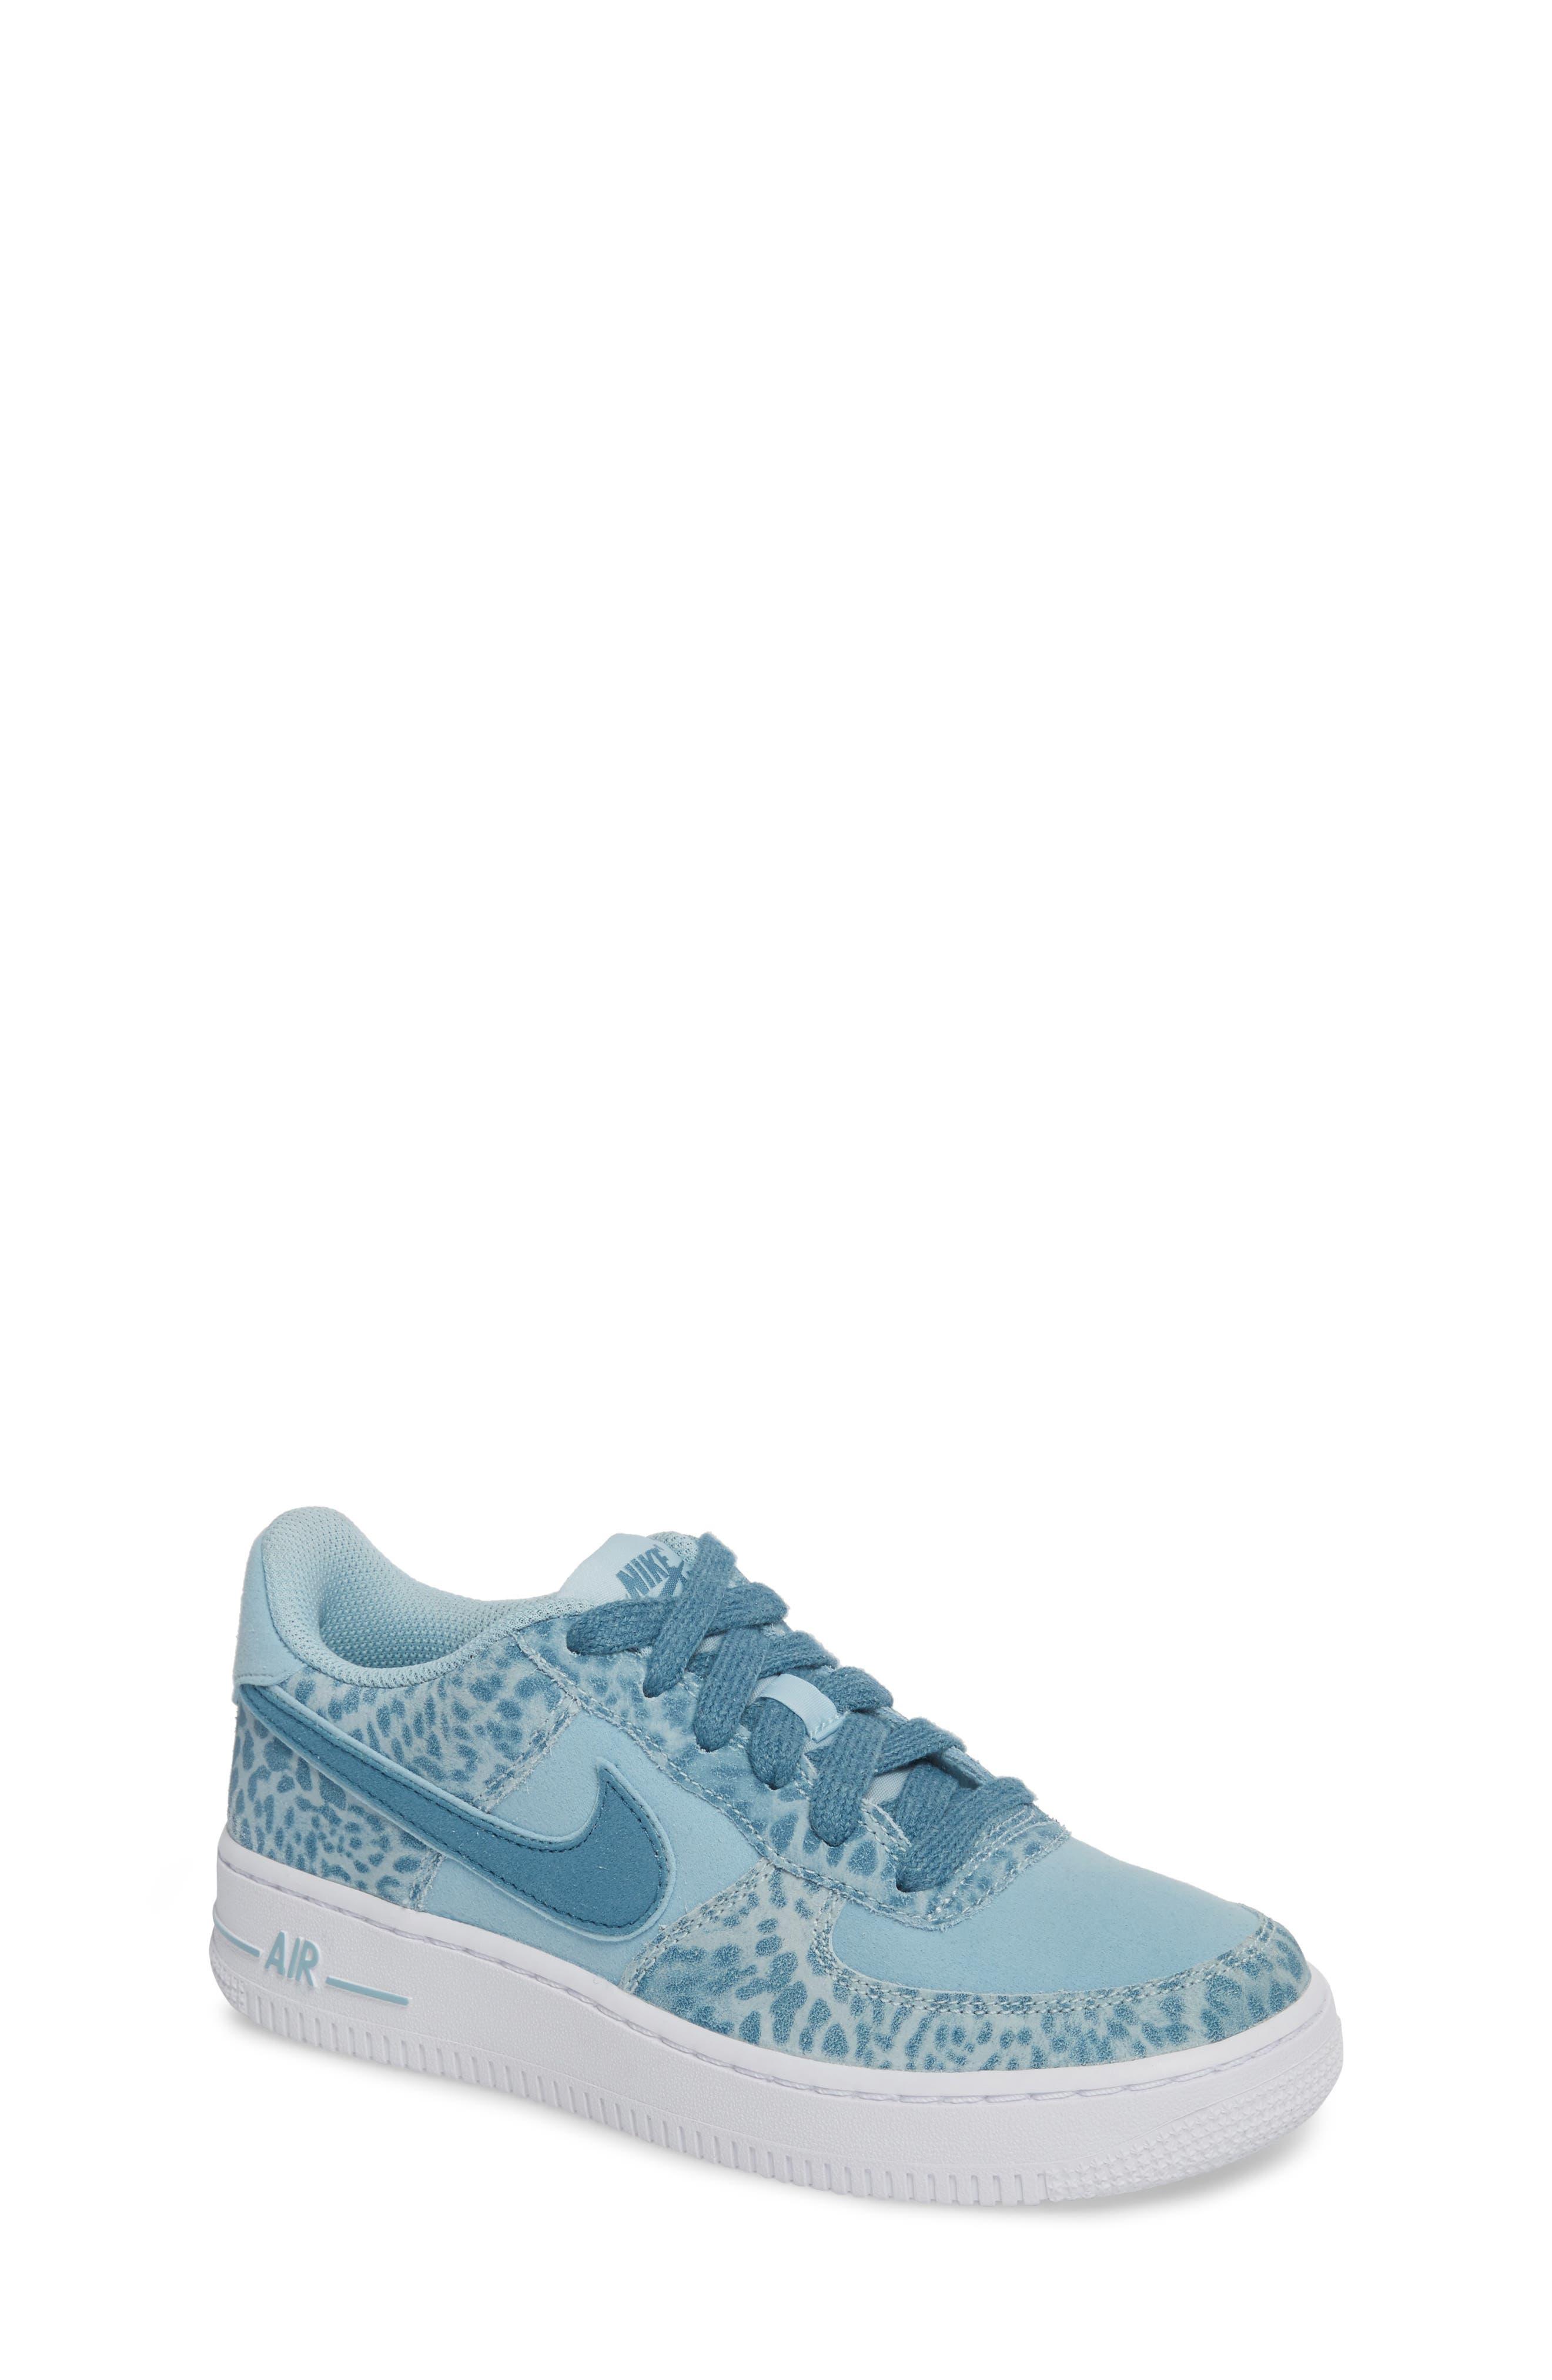 Air Force 1 LV8 Sneaker,                         Main,                         color, Ocean Bliss/ Noise Aqua/ White